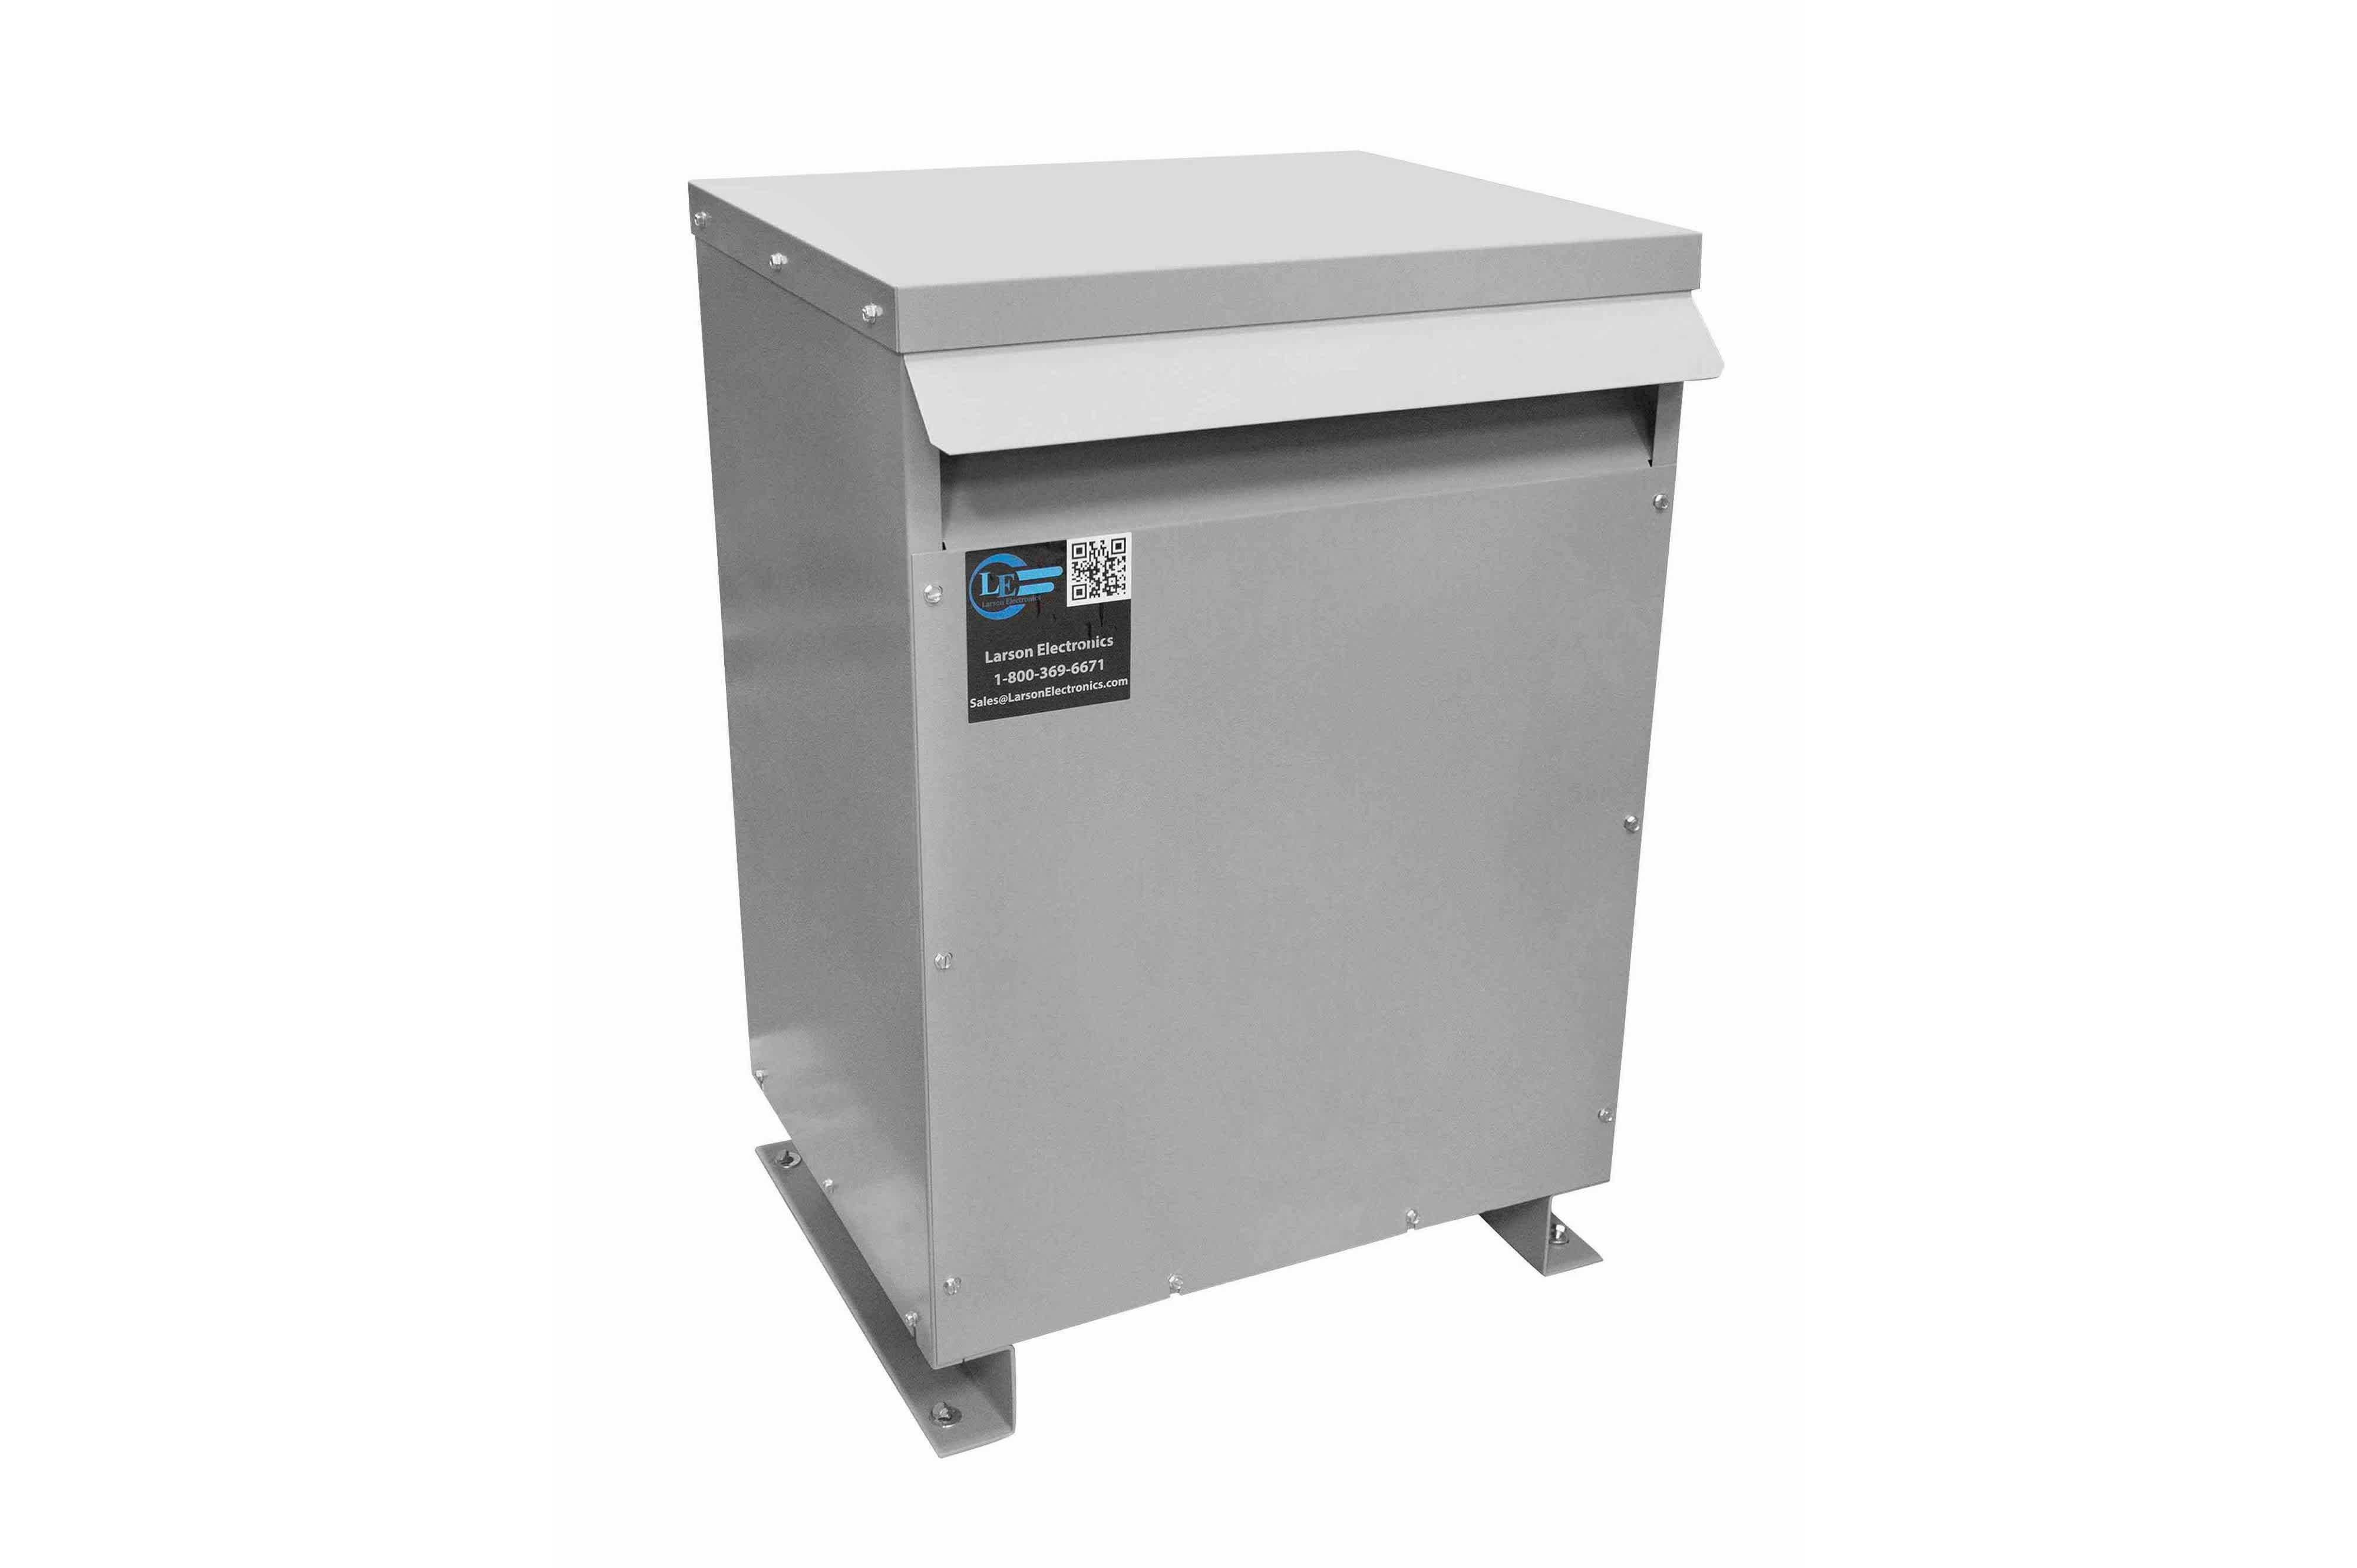 80 kVA 3PH DOE Transformer, 220V Delta Primary, 480Y/277 Wye-N Secondary, N3R, Ventilated, 60 Hz